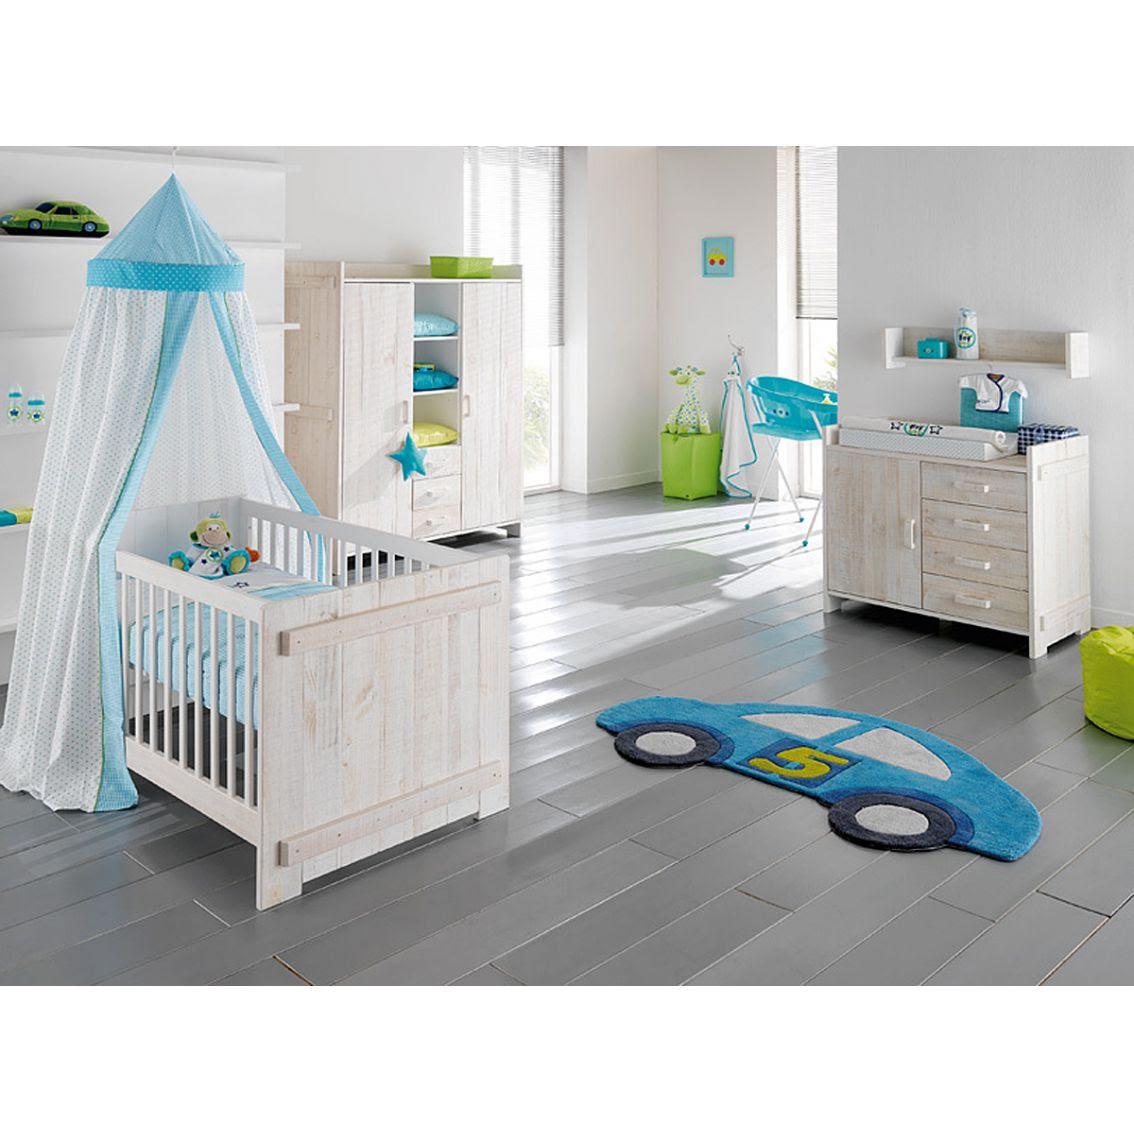 Baby Furniture | Design Builders